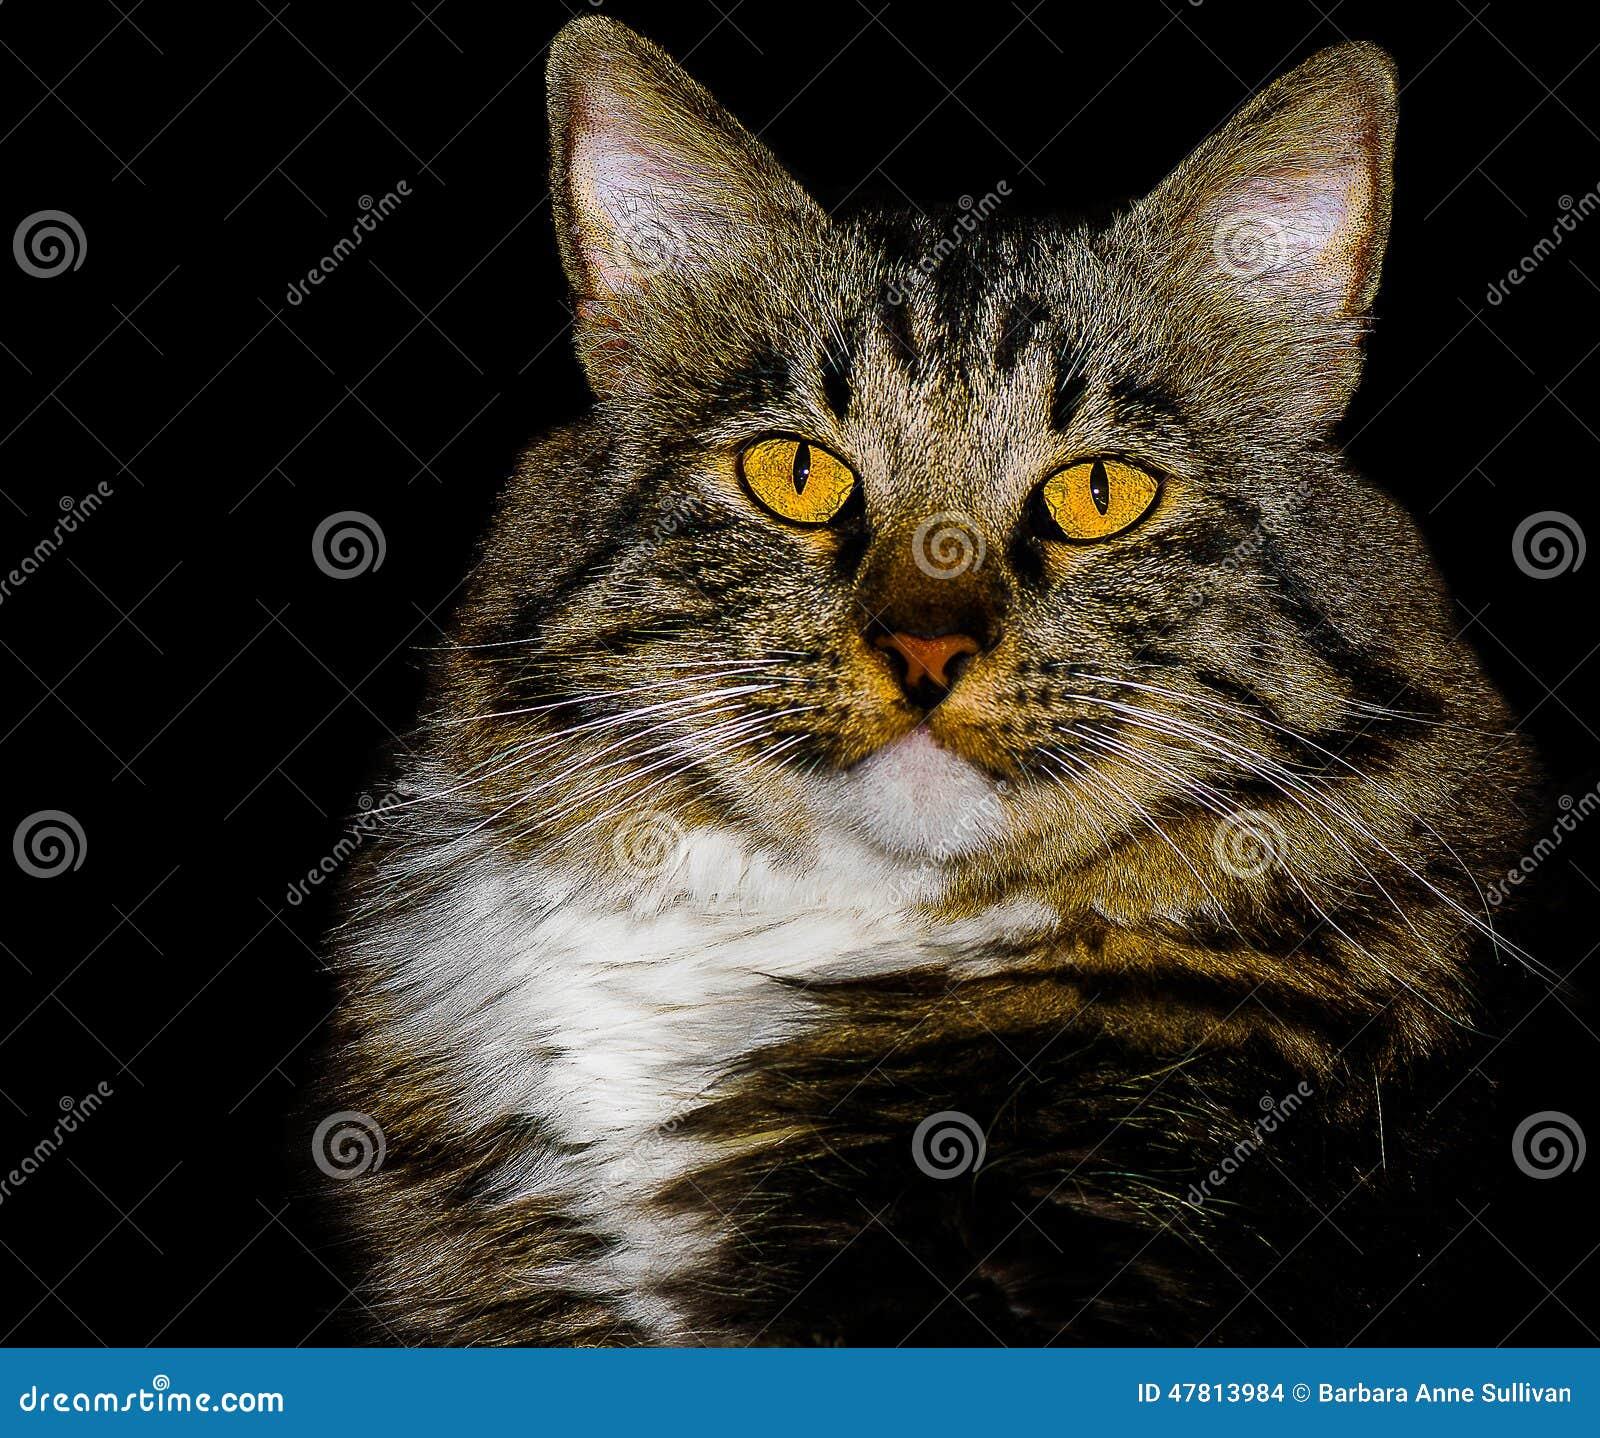 Raça Cat With Stunning Yellow Eyes da mistura do rabo cortado do americano